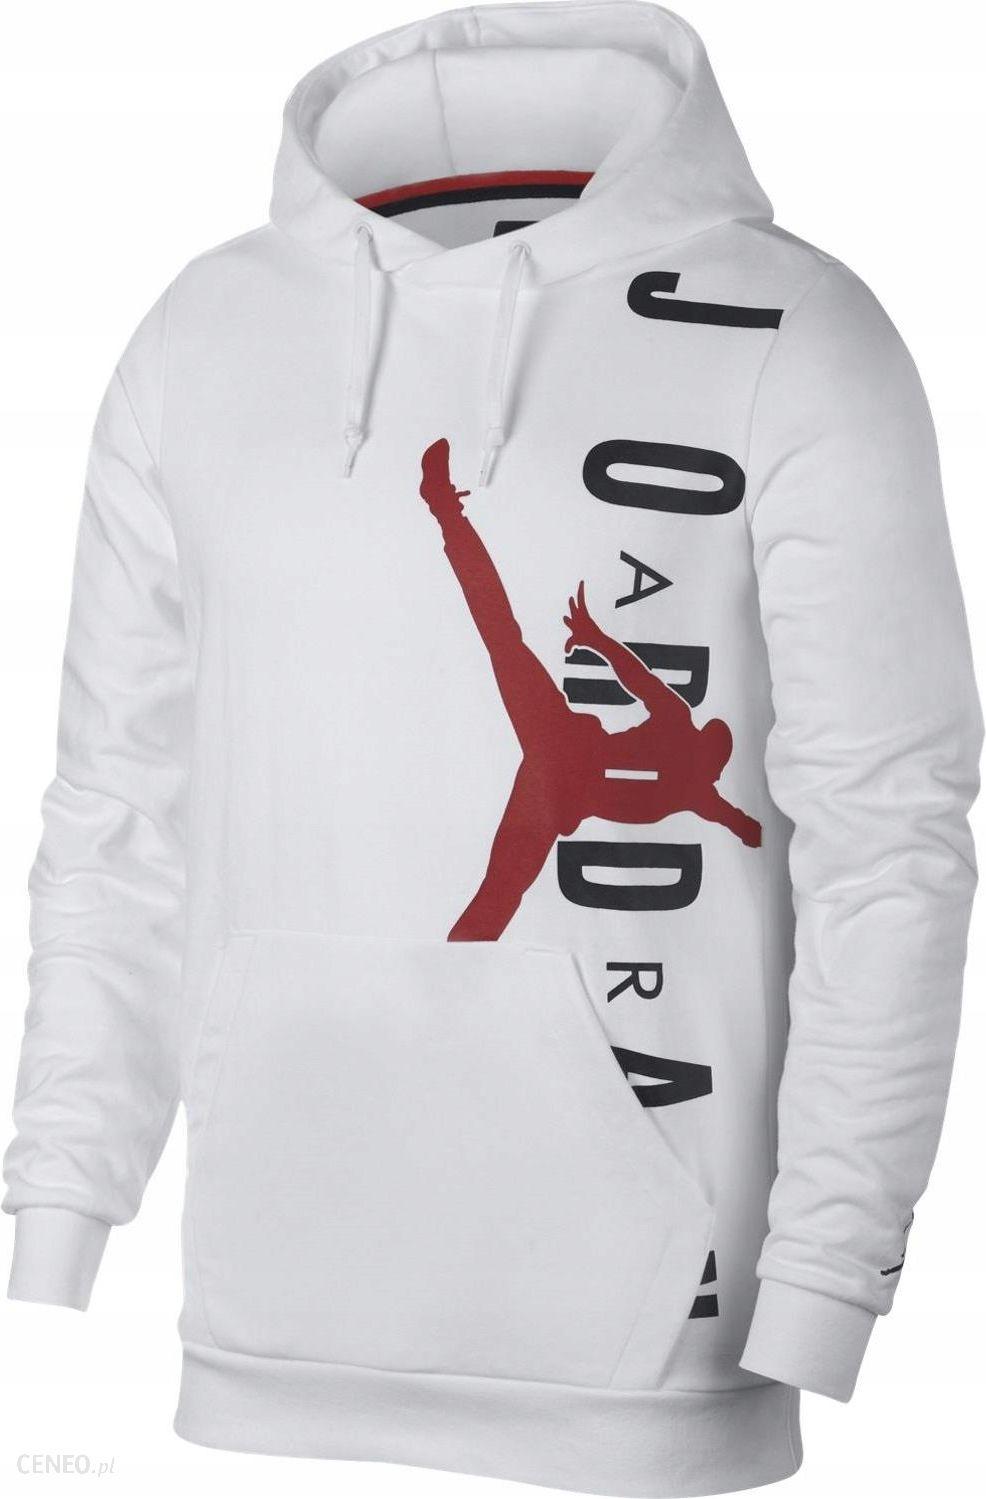 L Bluza Nike Jordan Jumpman AO0446 100 Biała Ceny i opinie